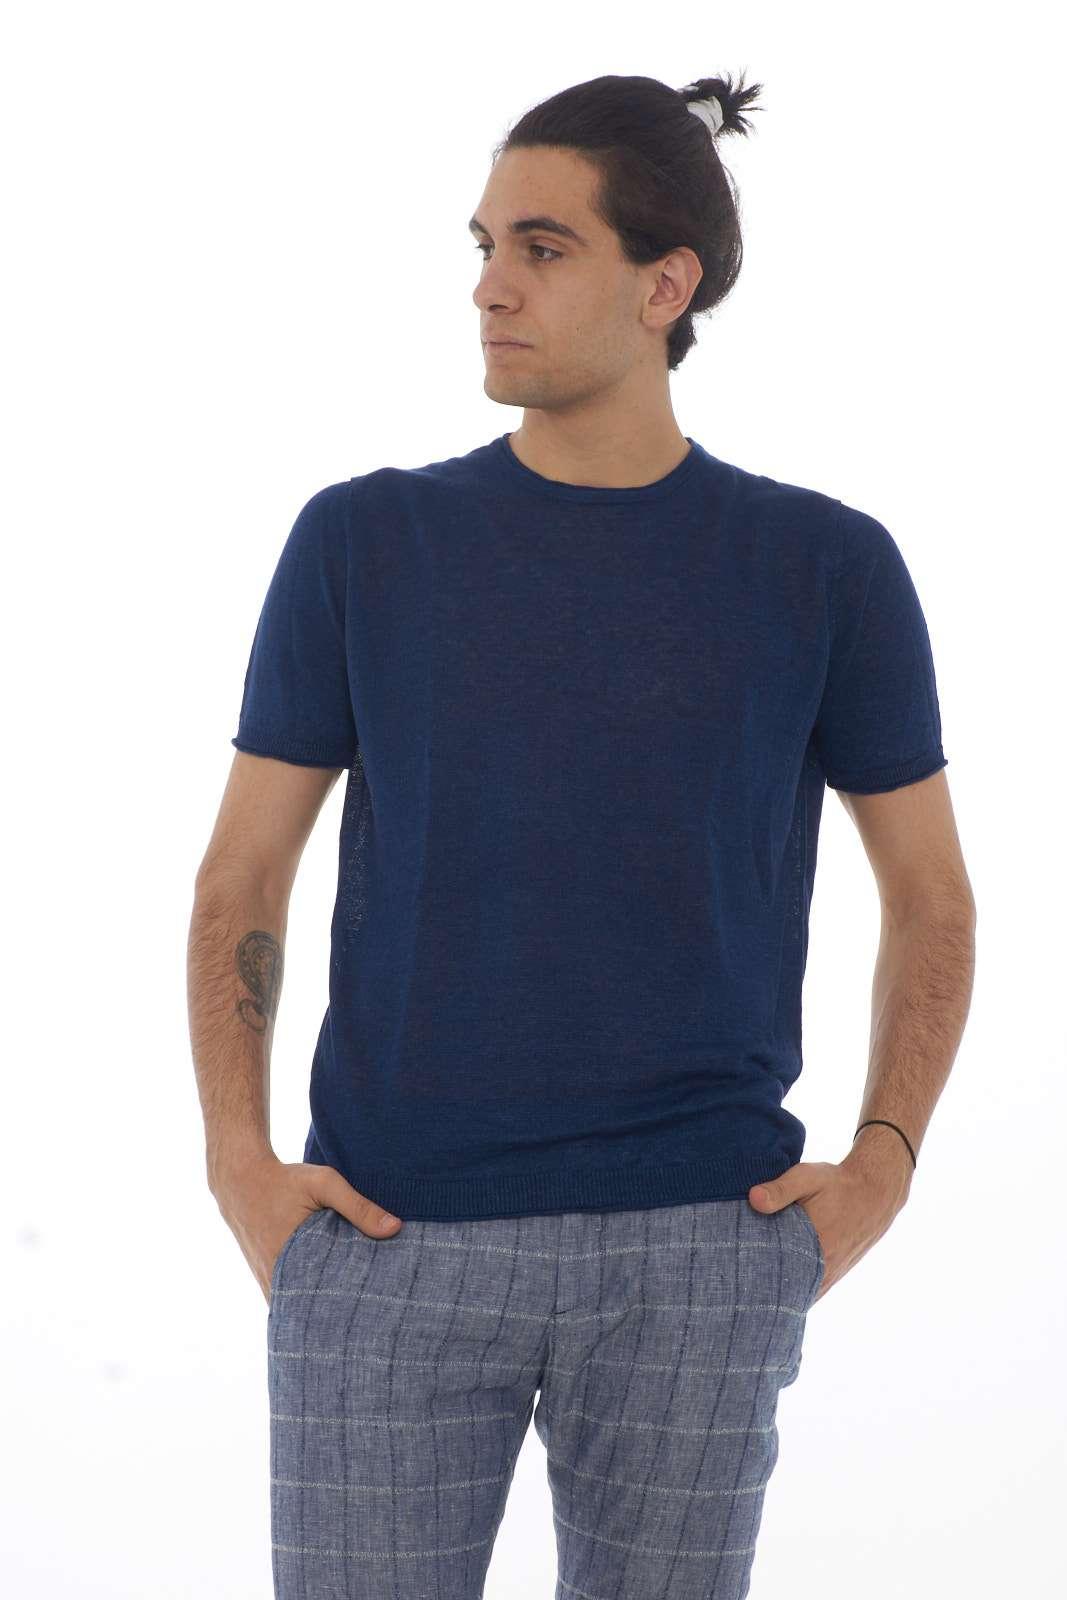 https://www.parmax.com/media/catalog/product/a/i/PE-outlet_parmax-t-shirt-uomo-Kangra-9EK7013-A.jpg